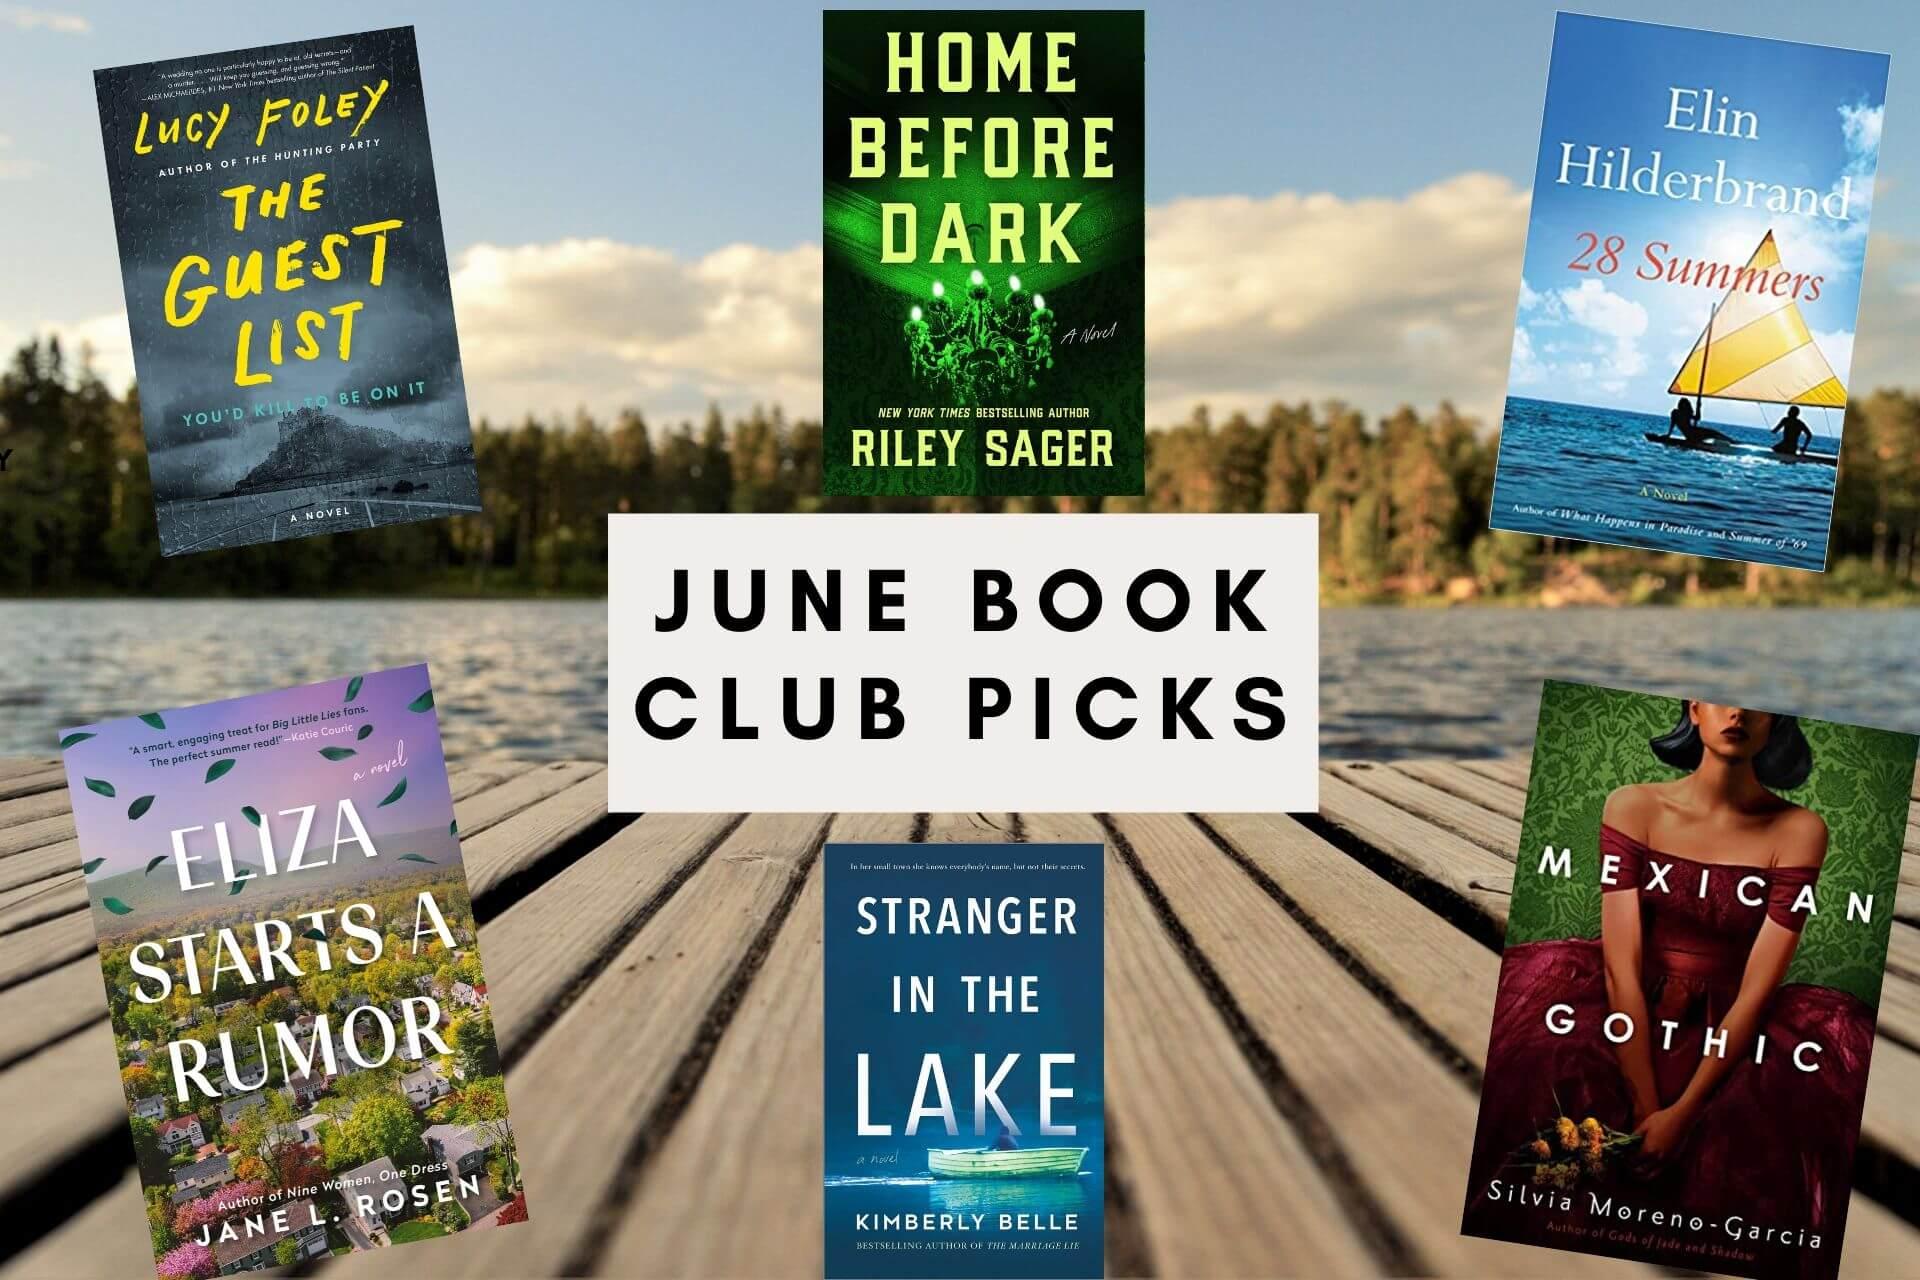 june book club picks 2020 - book club chat